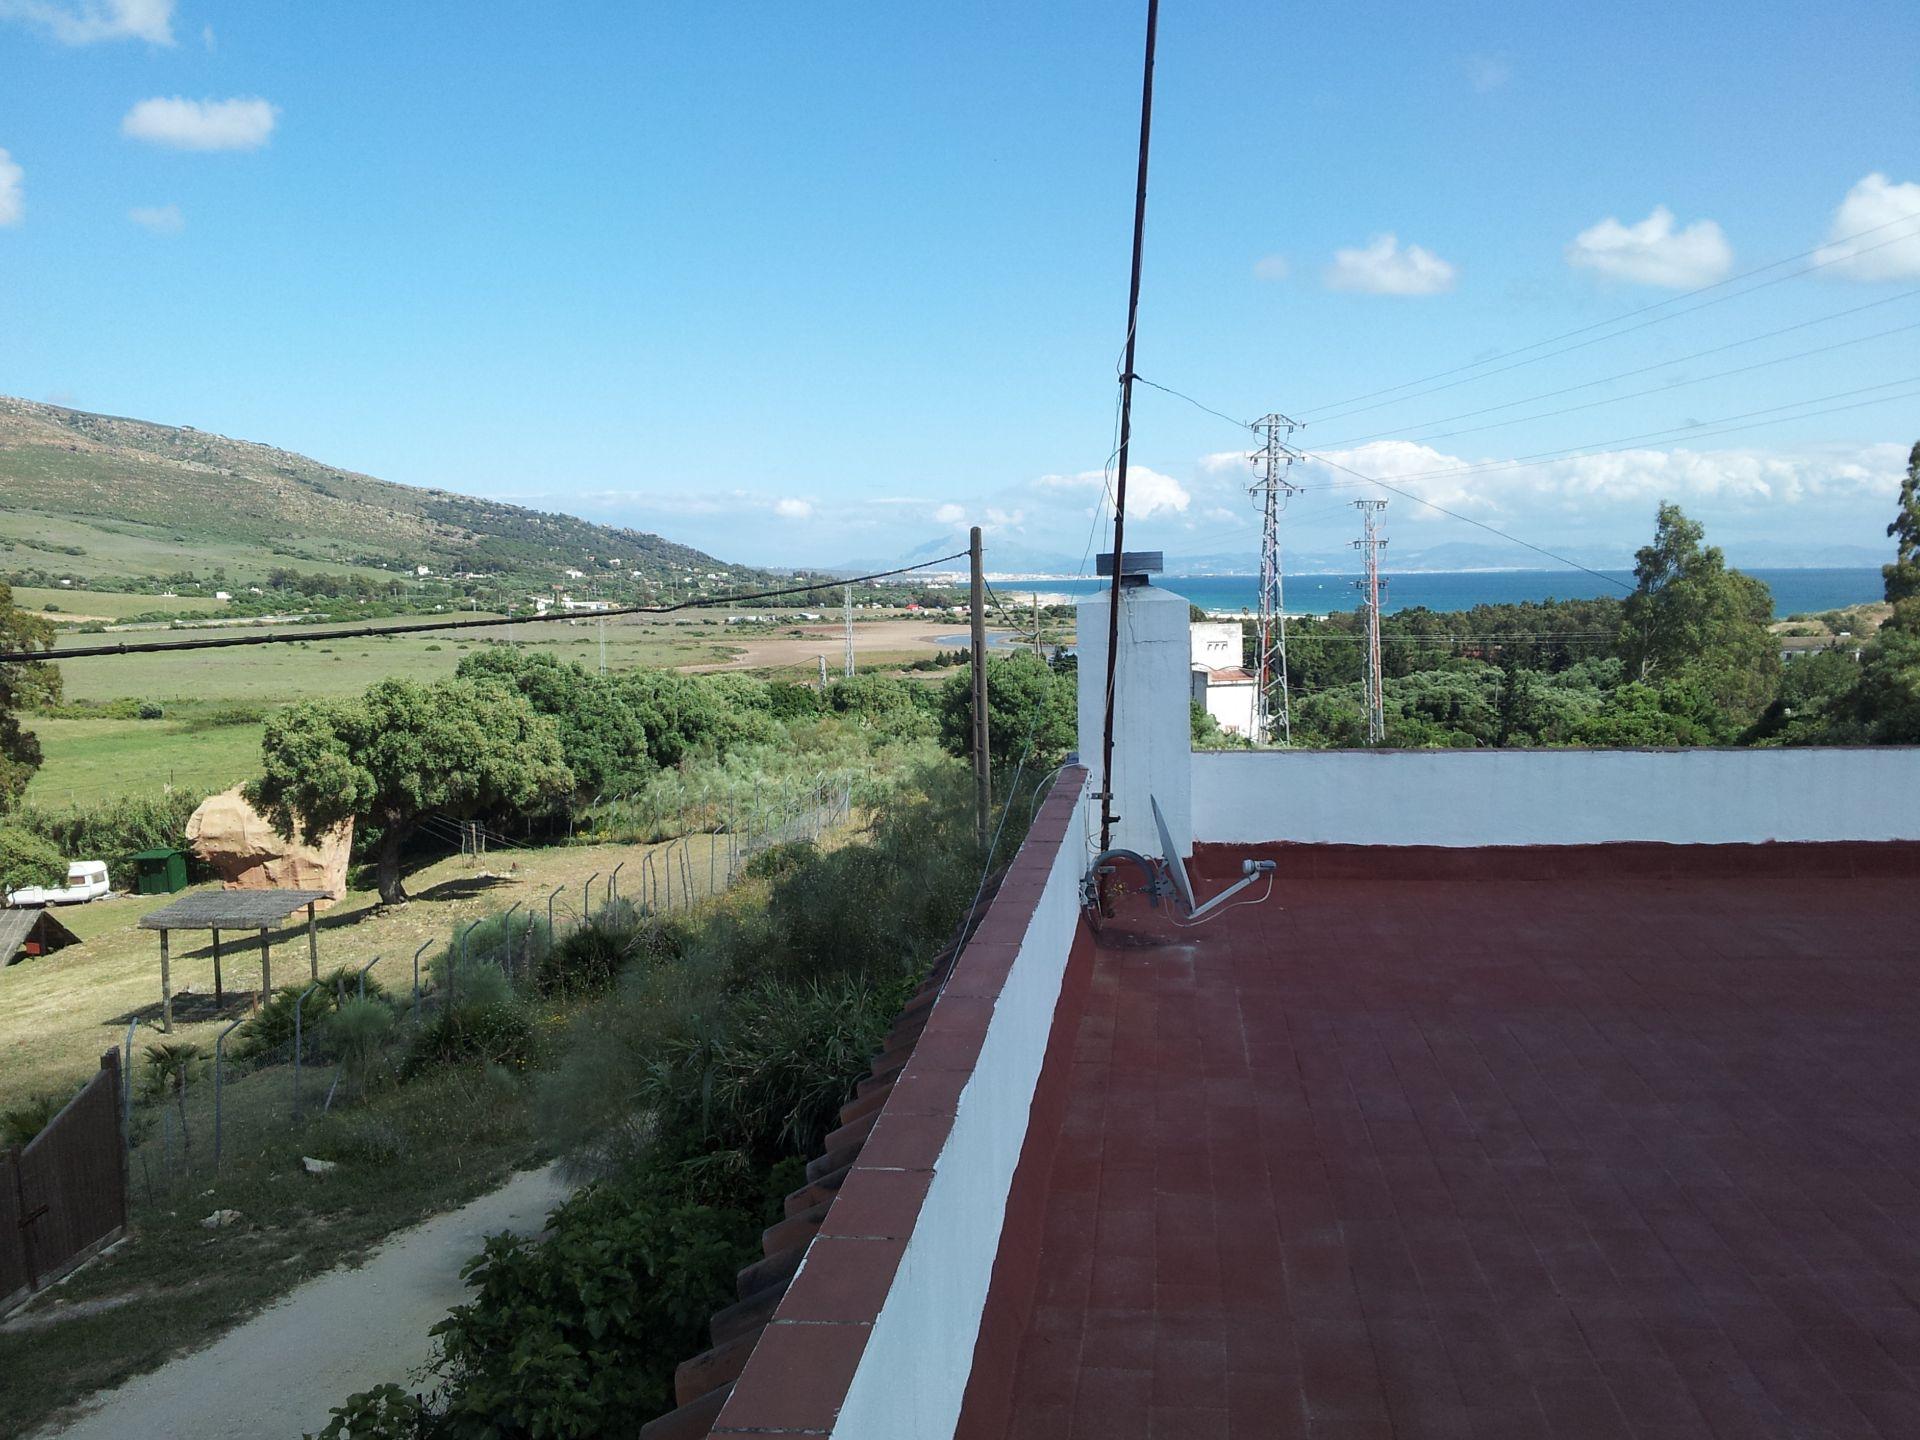 Casa de campo en Tarifa, Punta Paloma, venta